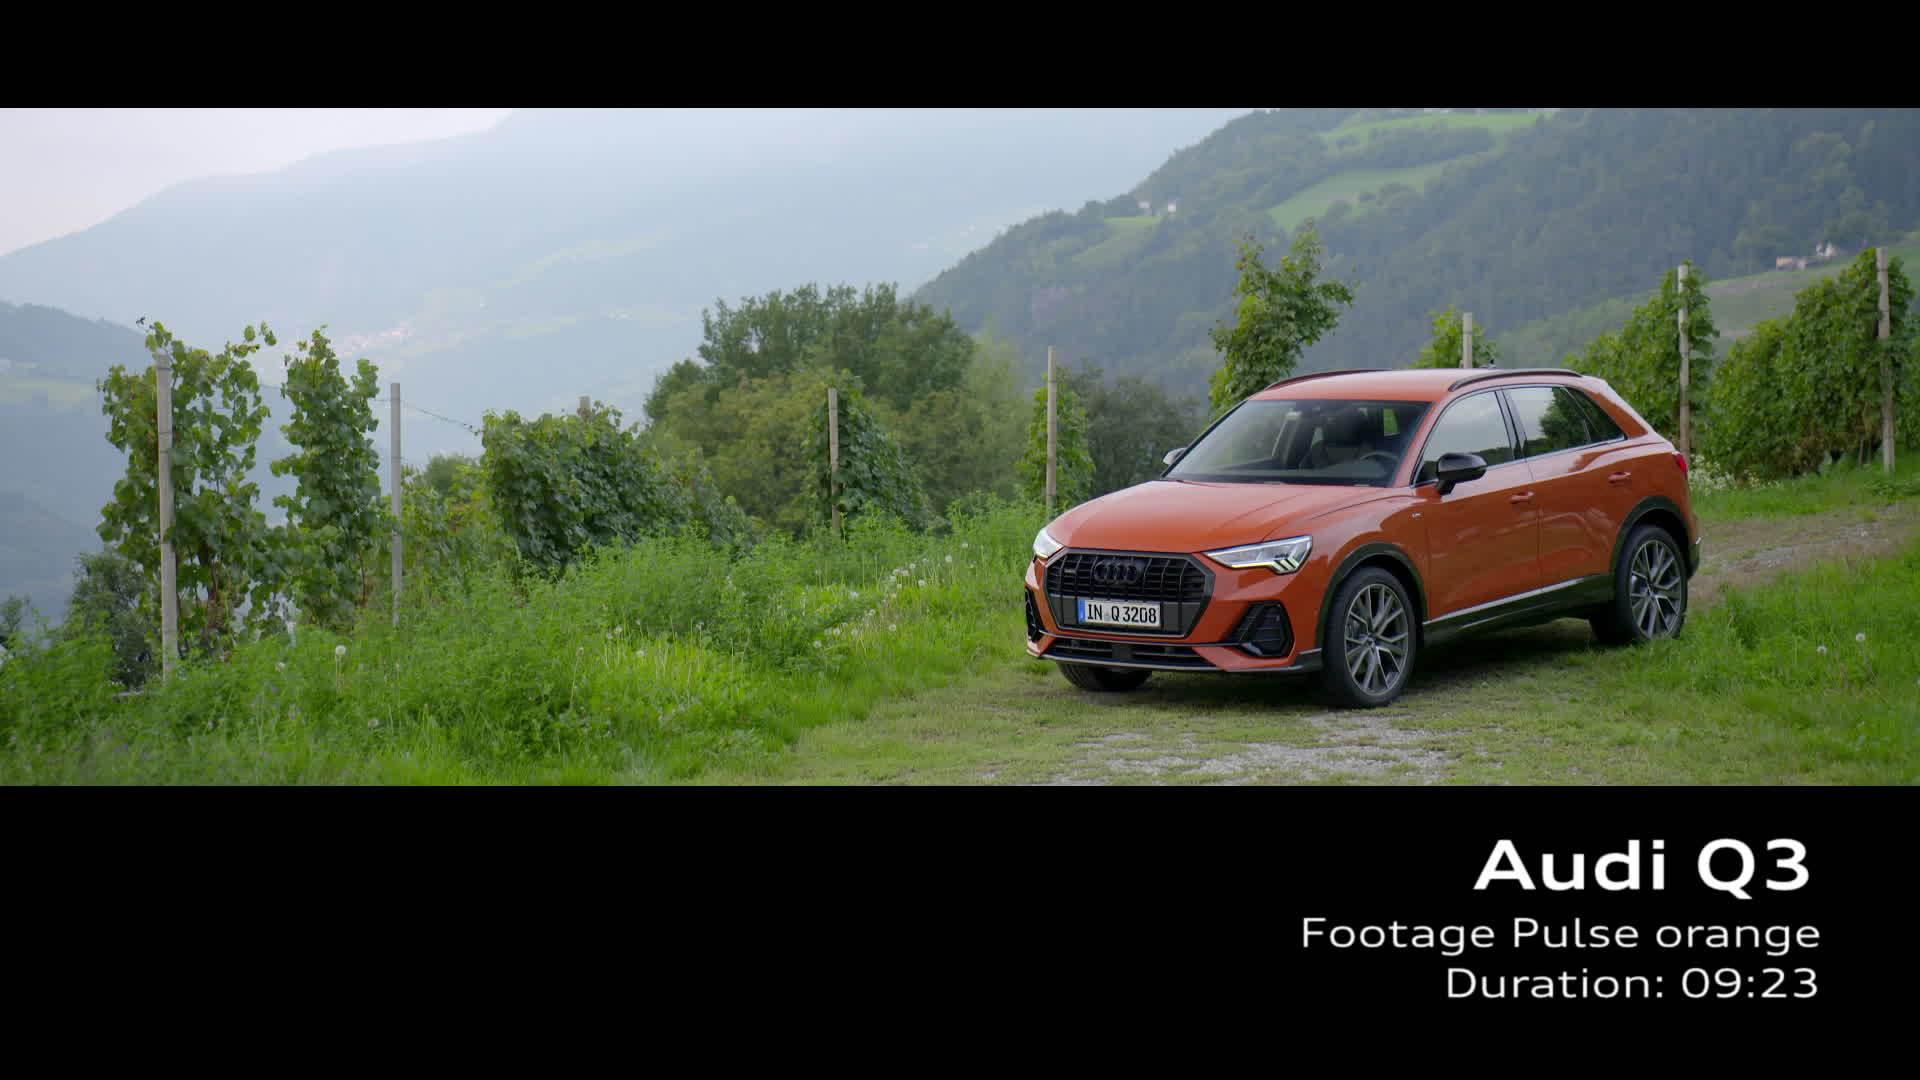 Audi Q3 Footage Pulsorange (2018)